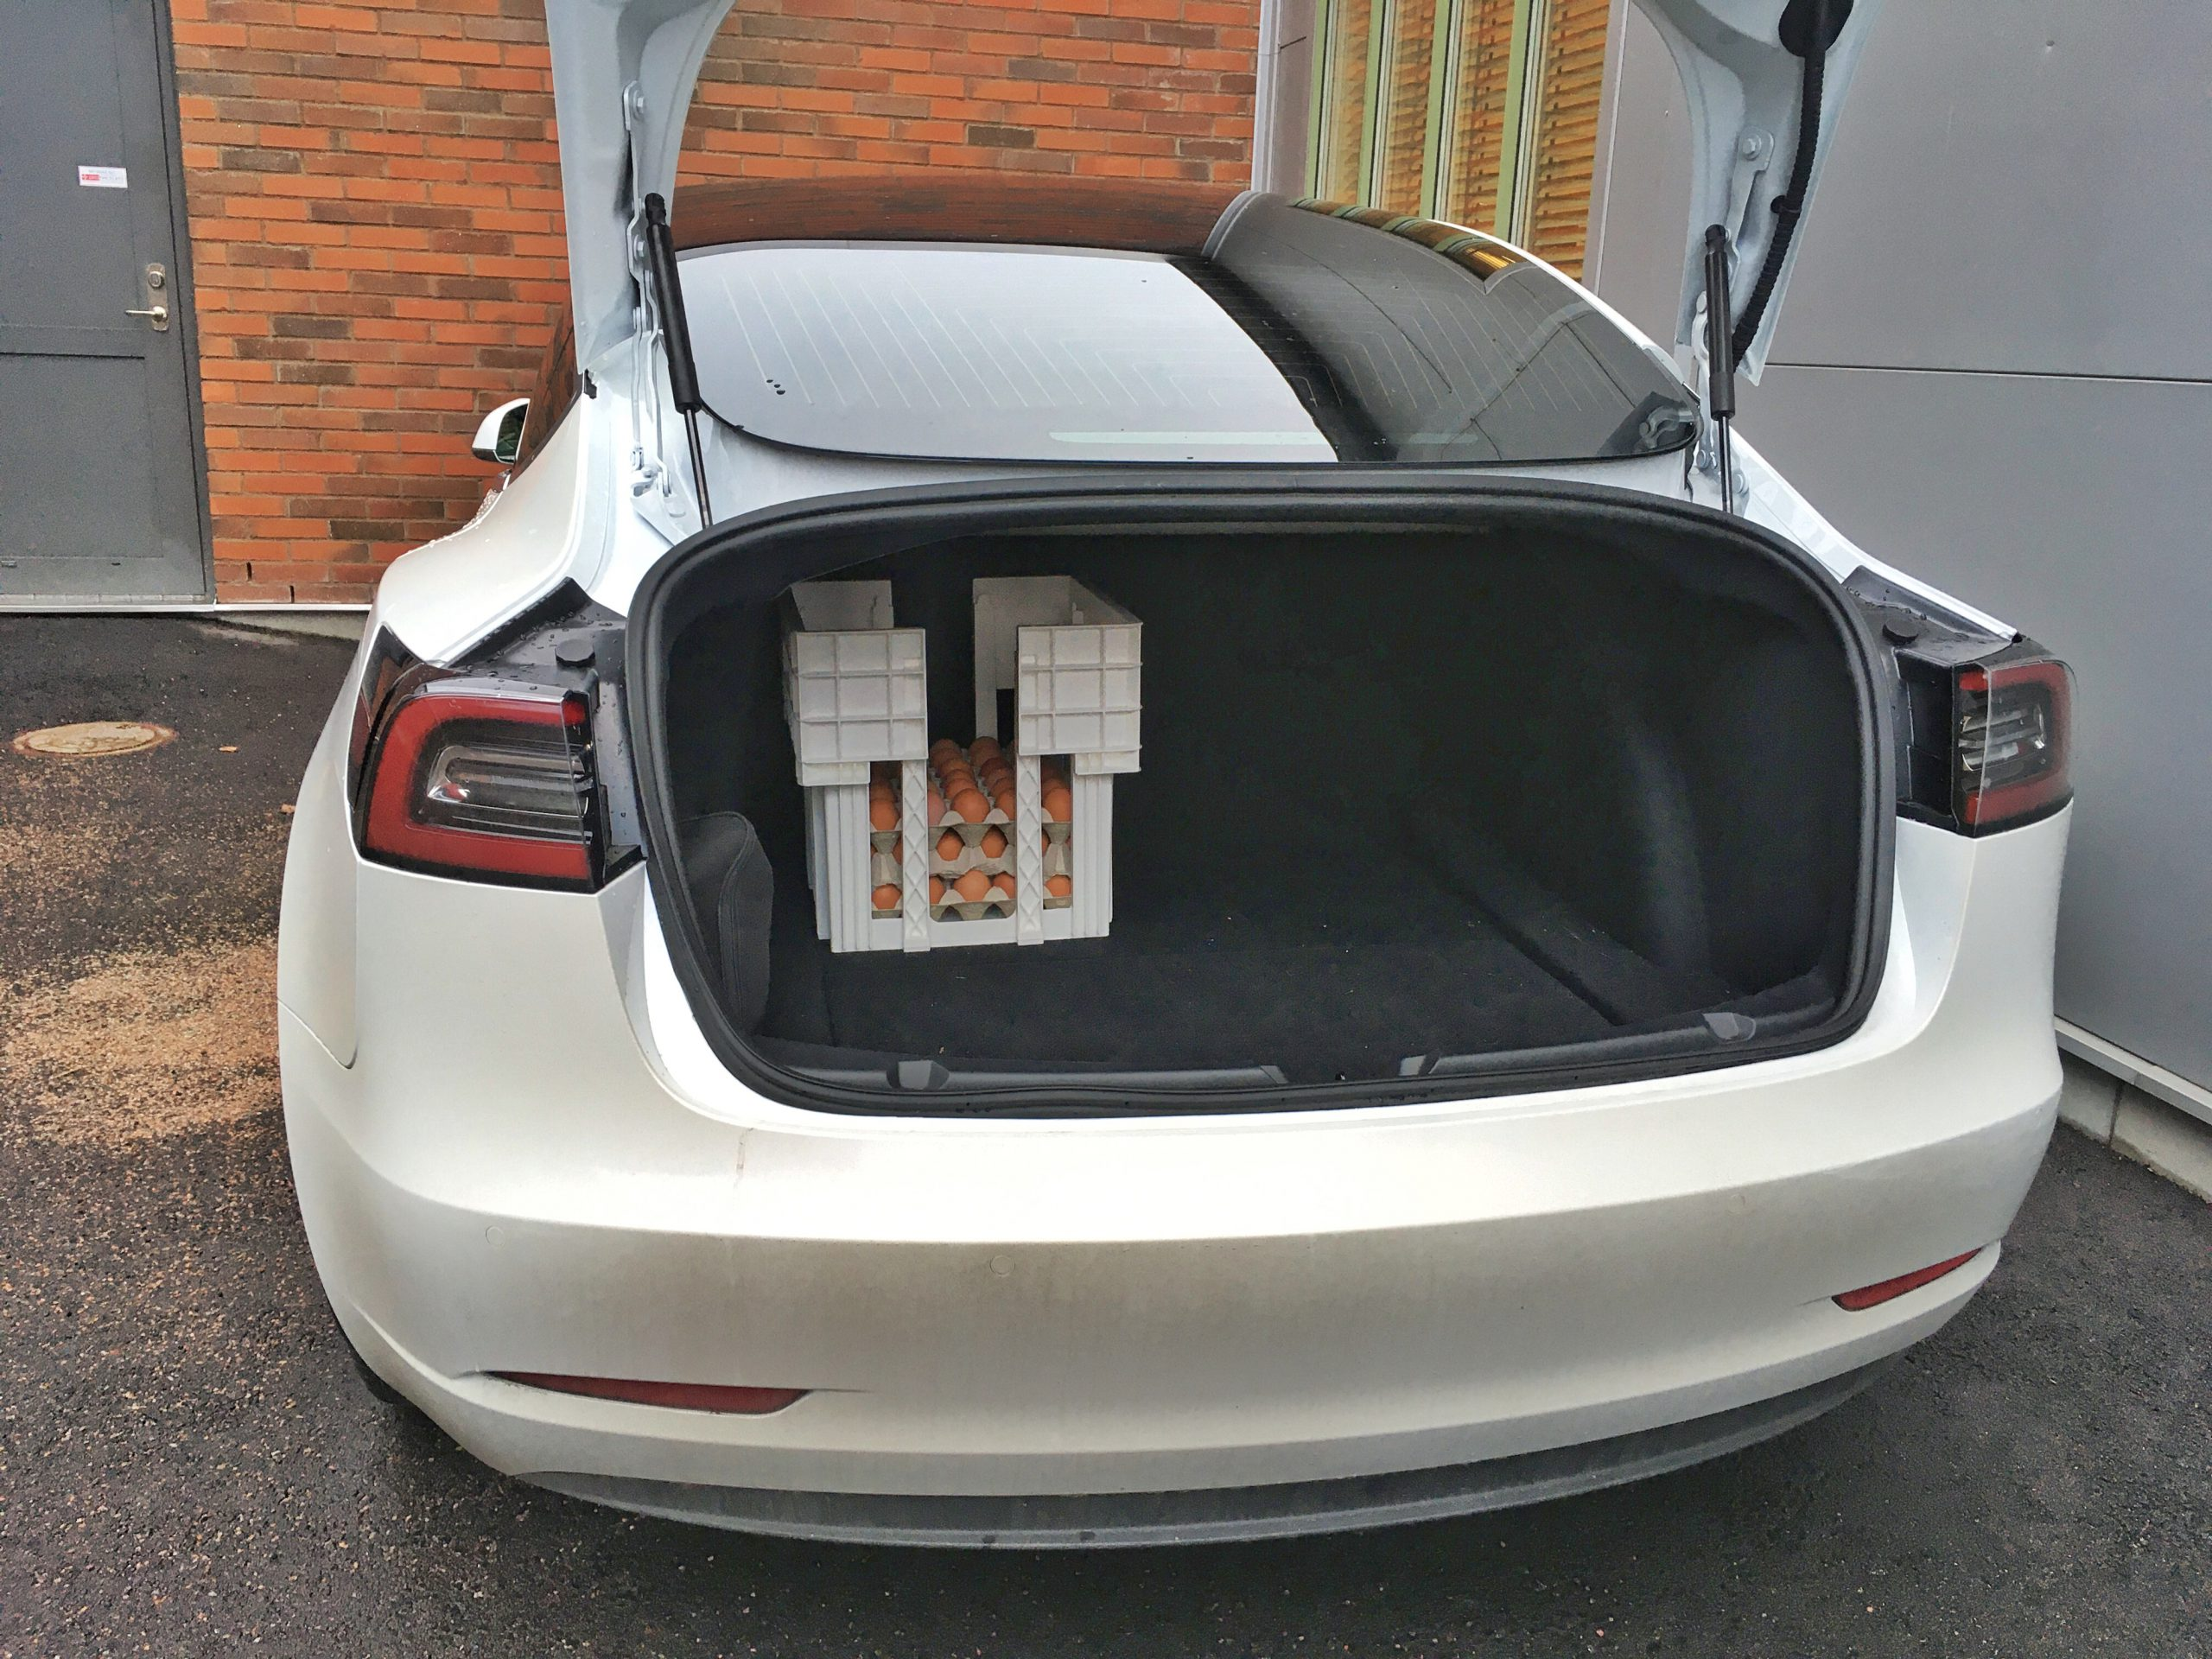 En äggback lastad i en Tesla Model 3